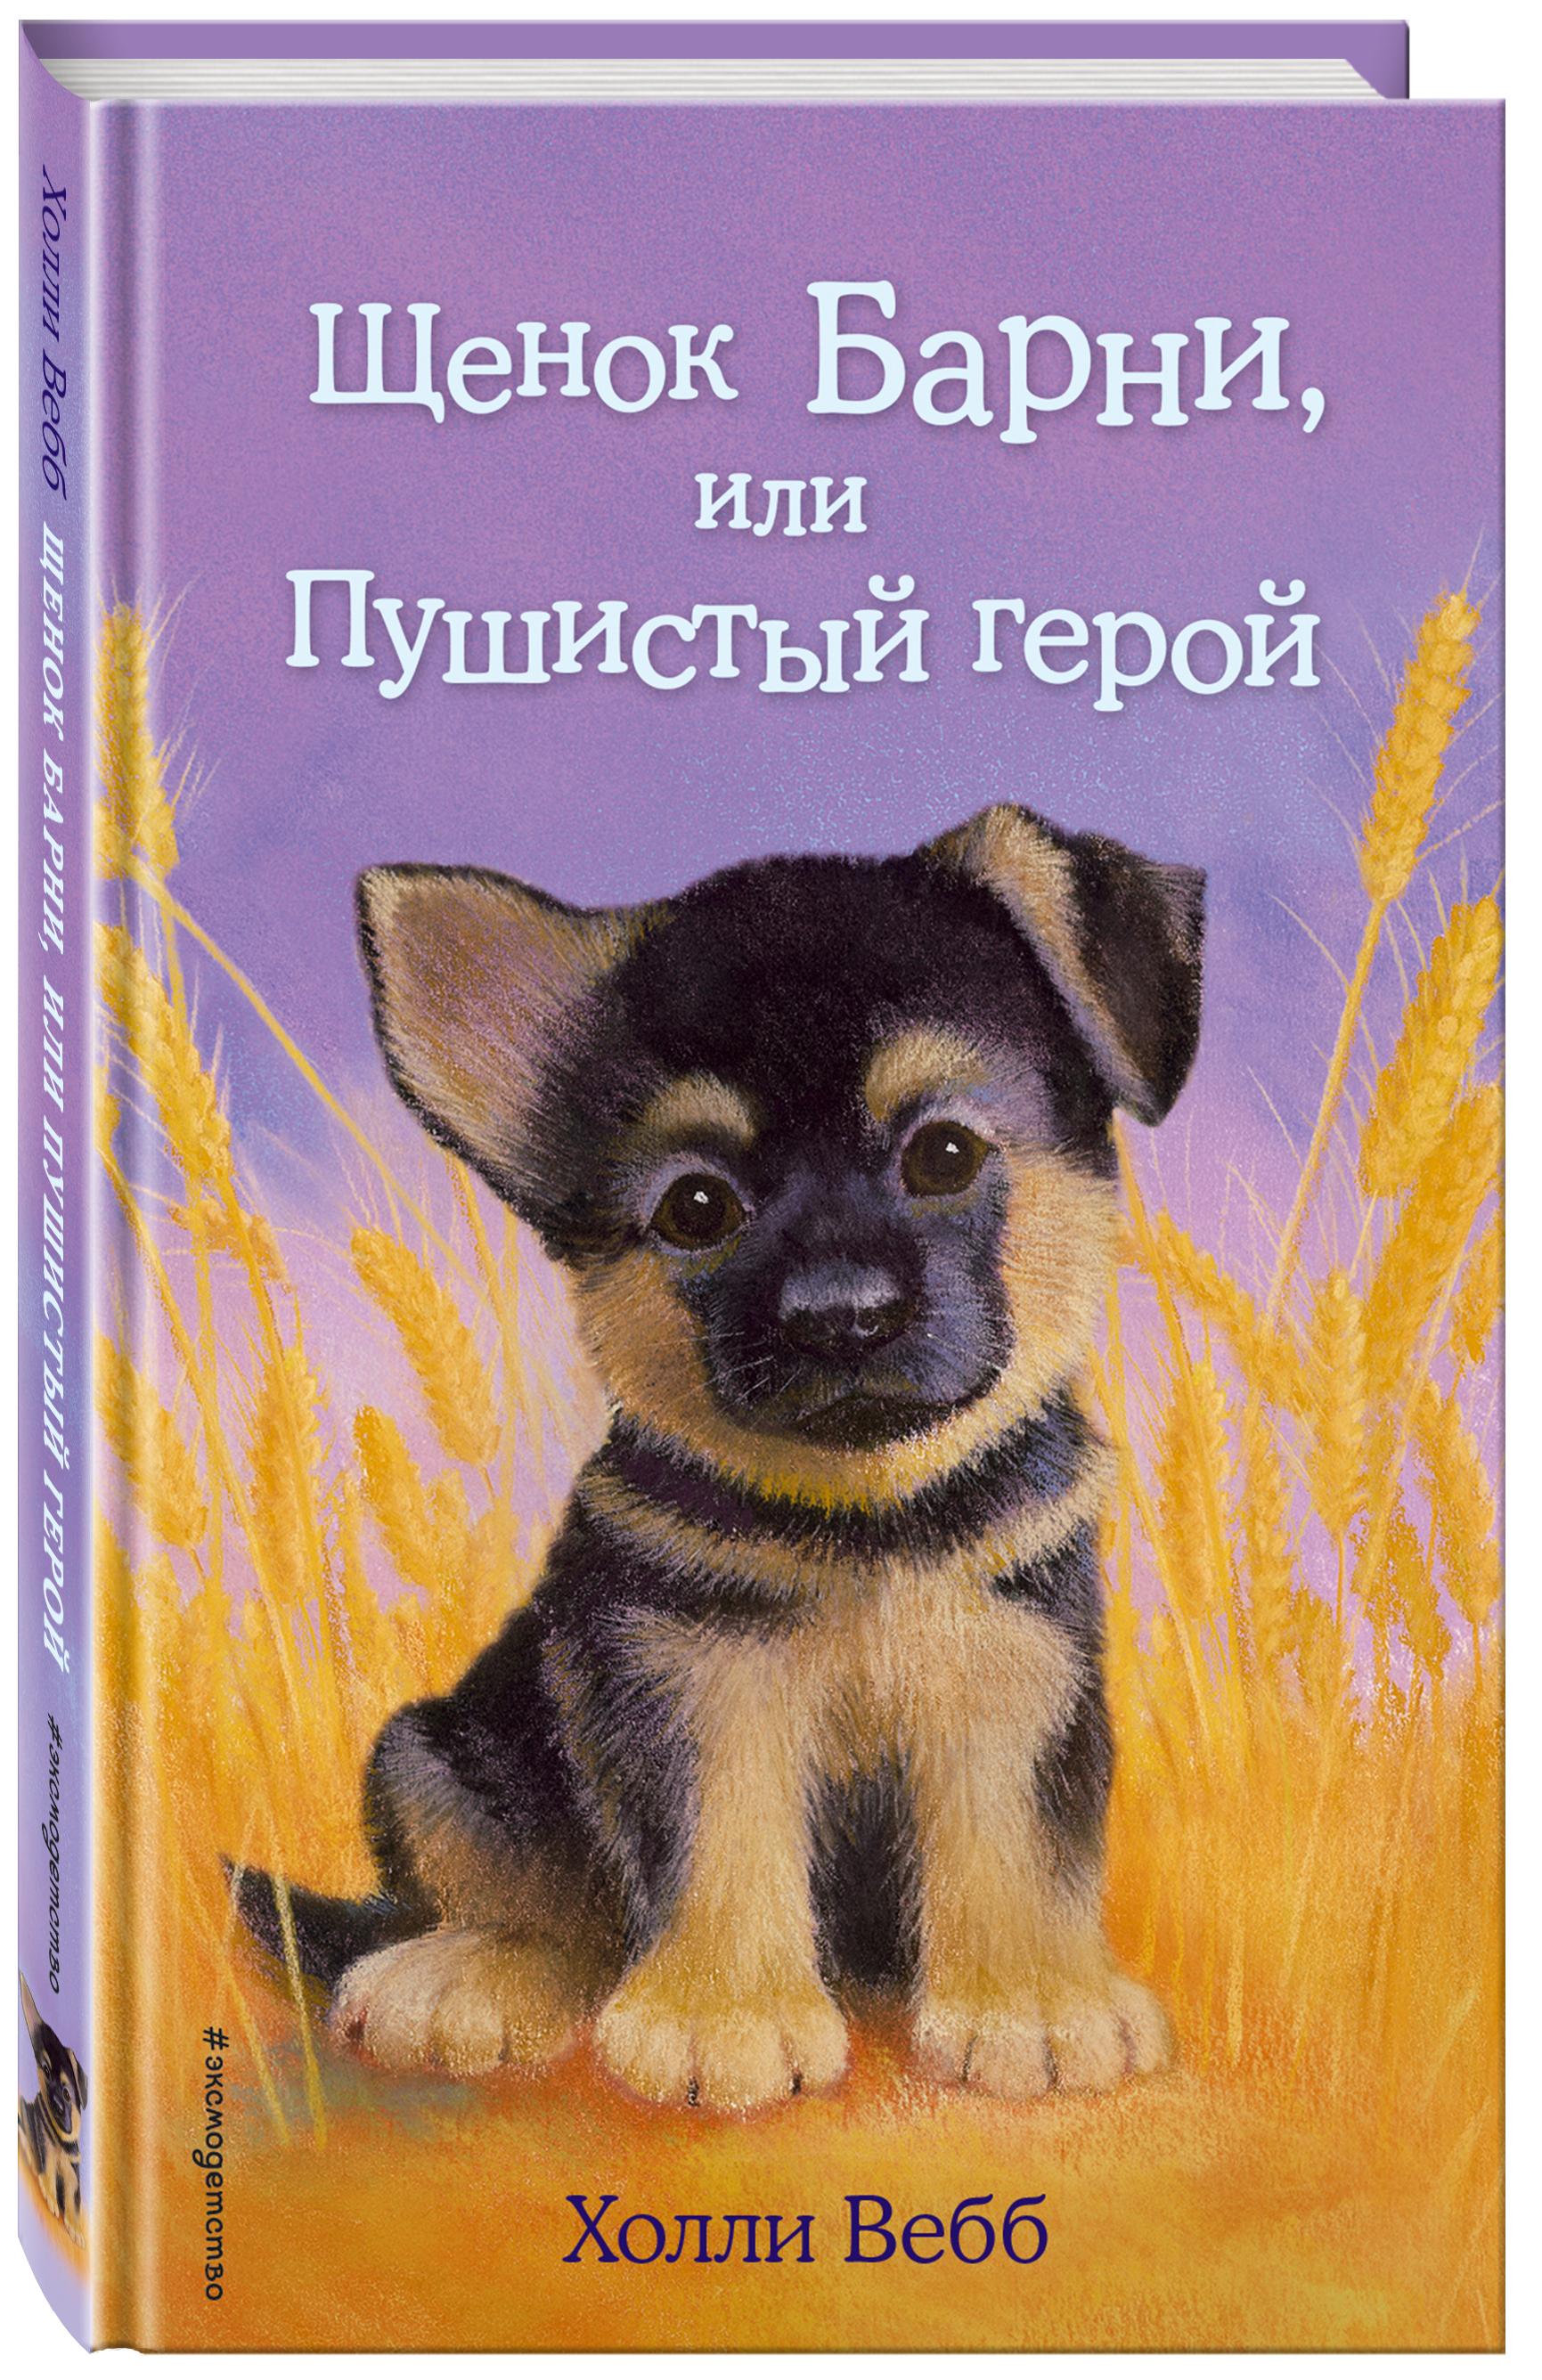 Вебб Х. Щенок Барни, или Пушистый герой ISBN: 978-5-699-79259-7 вебб х щенок барни или пушистый герой